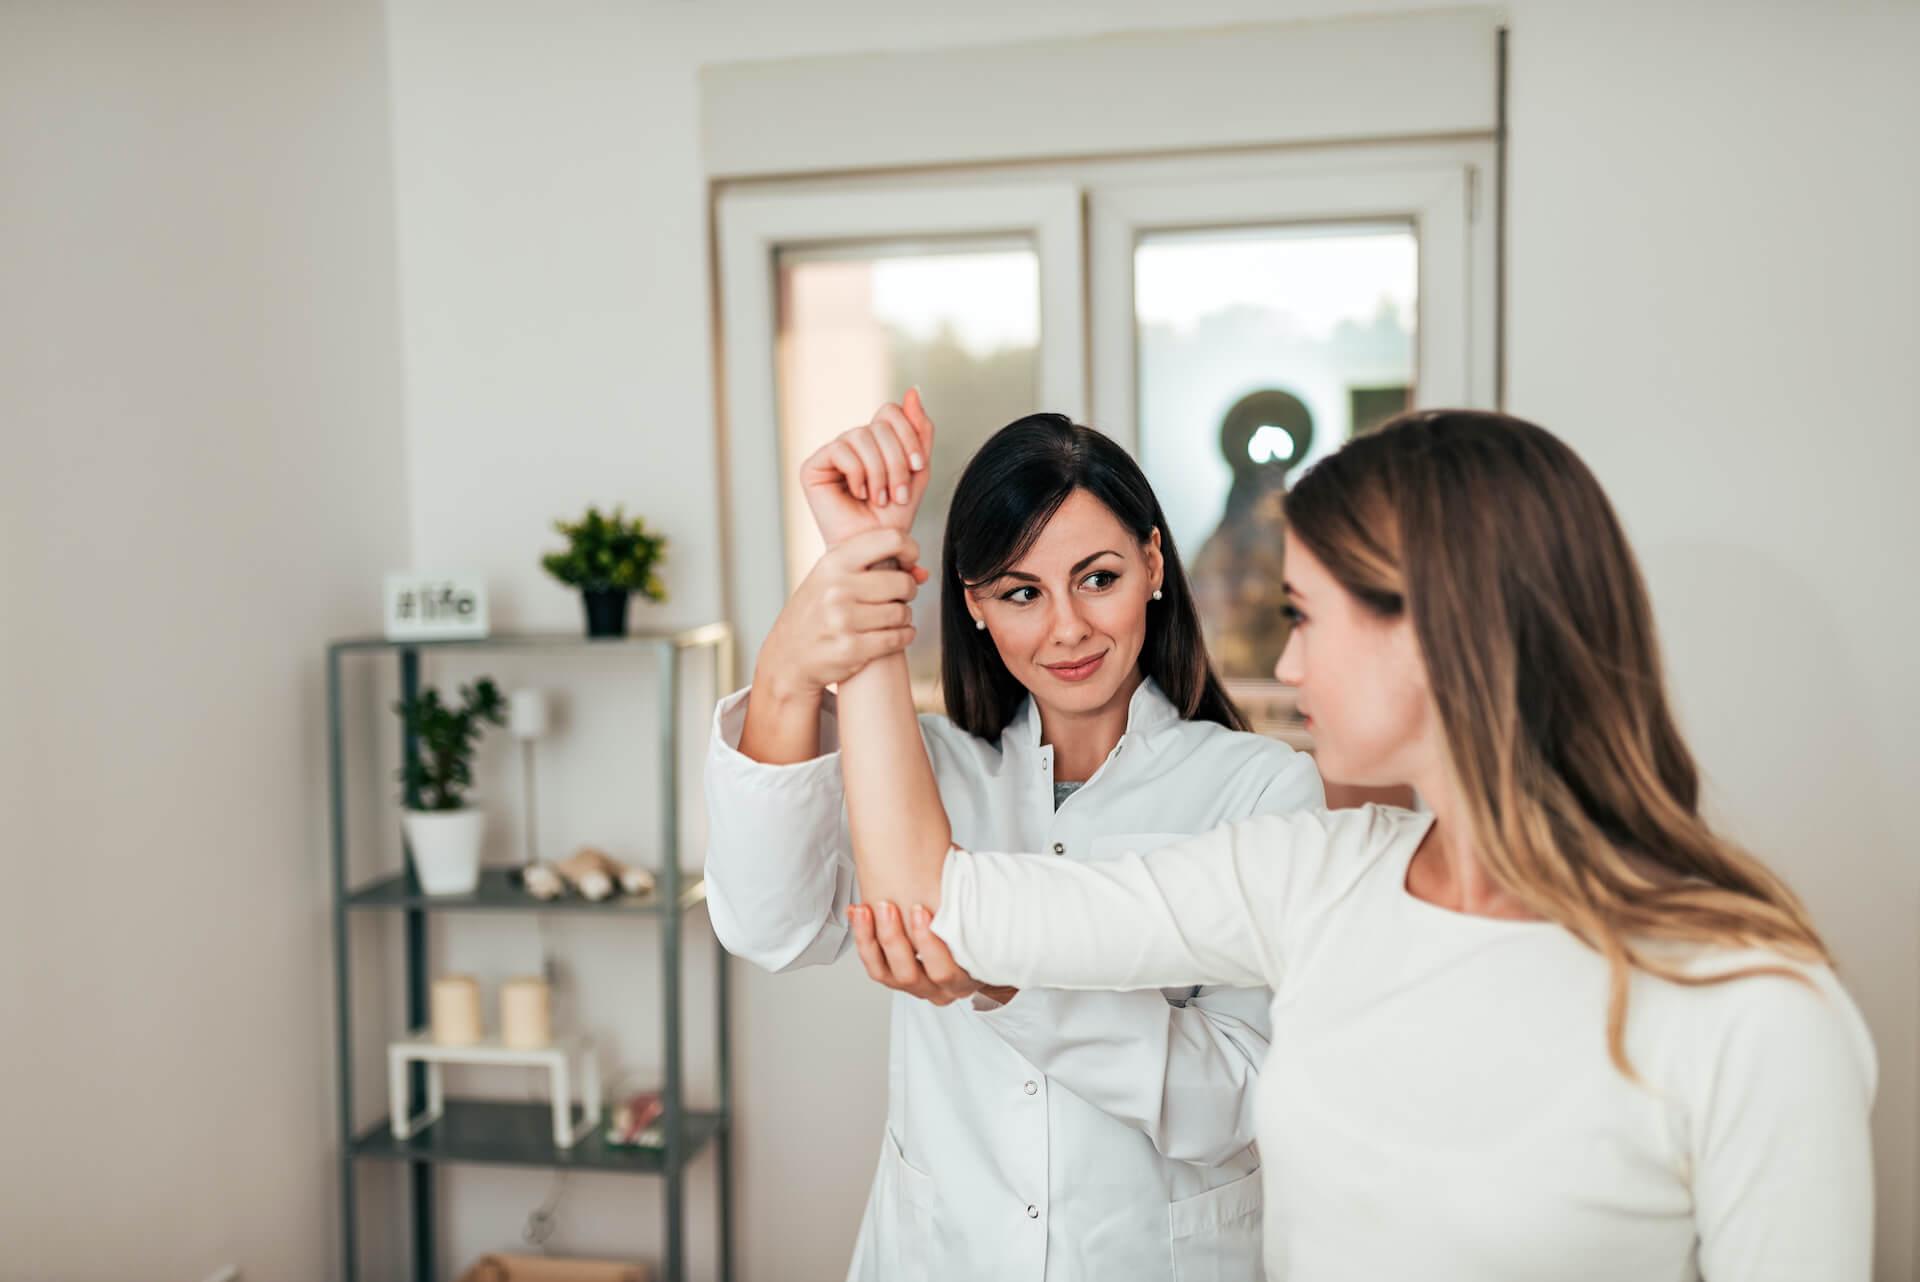 Healthcare professional evaluating a patient's arm.